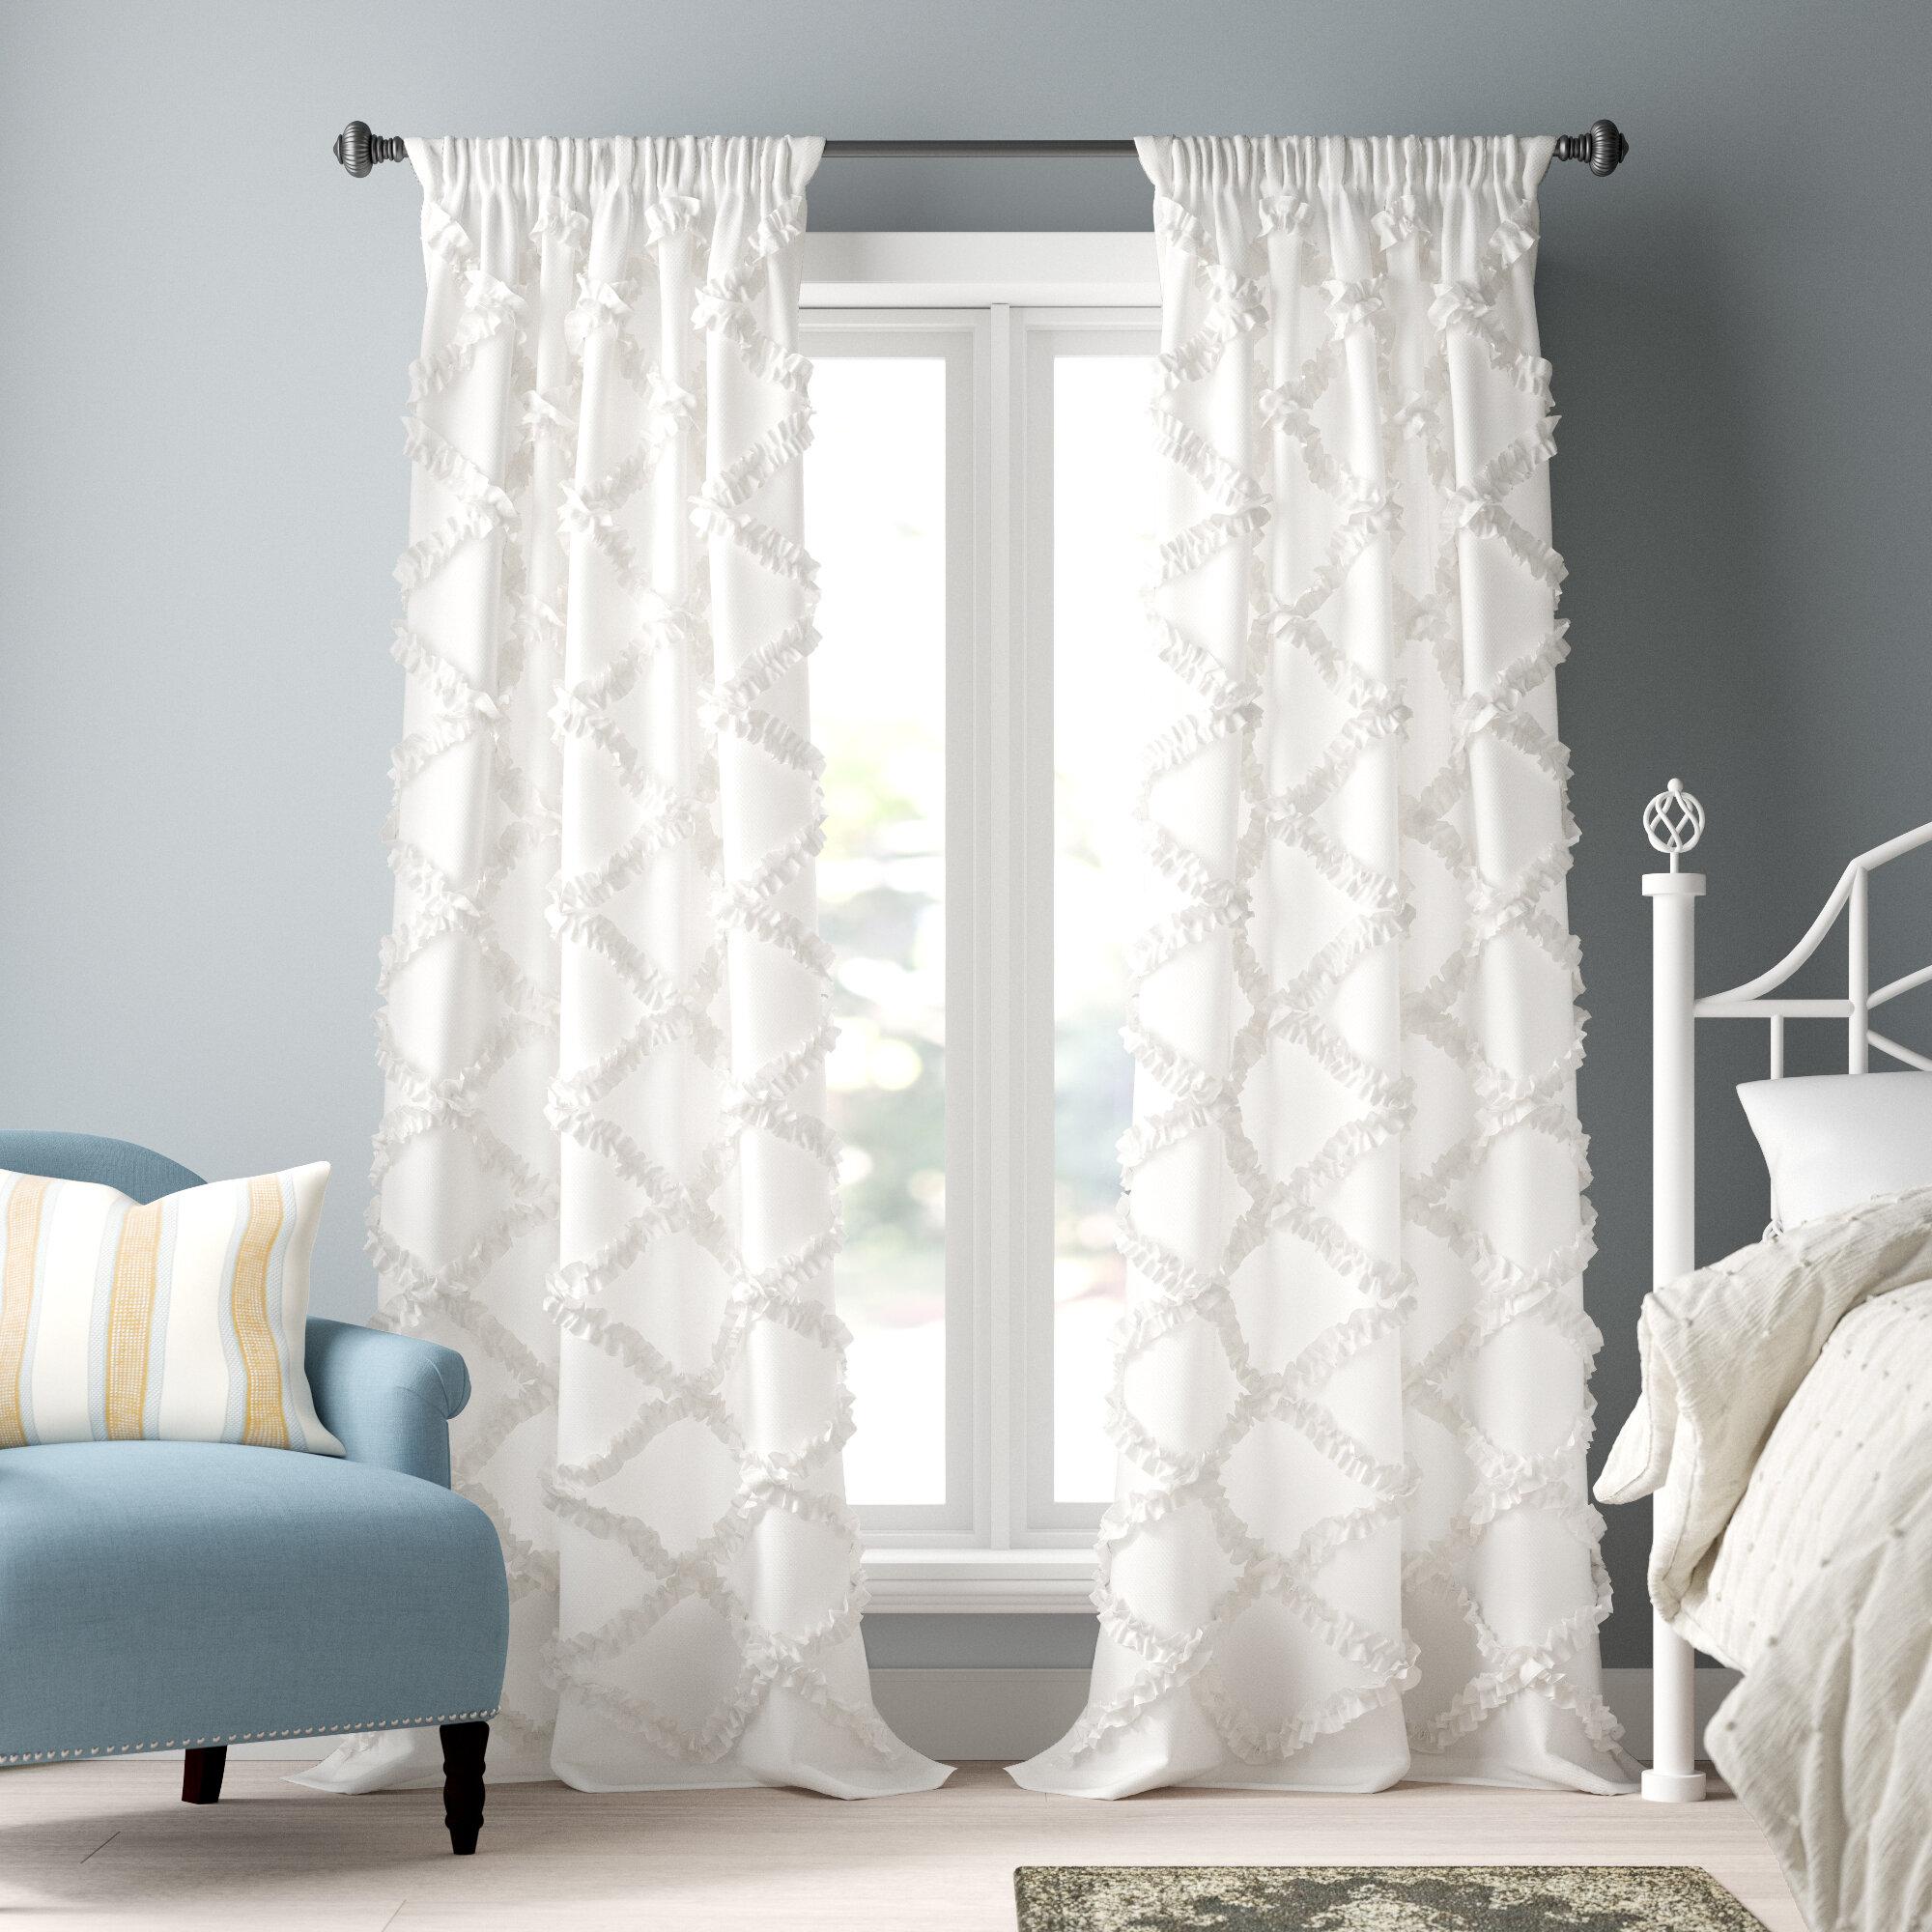 Lark Manor Ornellas Geometric Semi Sheer Thermal Rod Pocket Curtain Panel Reviews Wayfair Ca